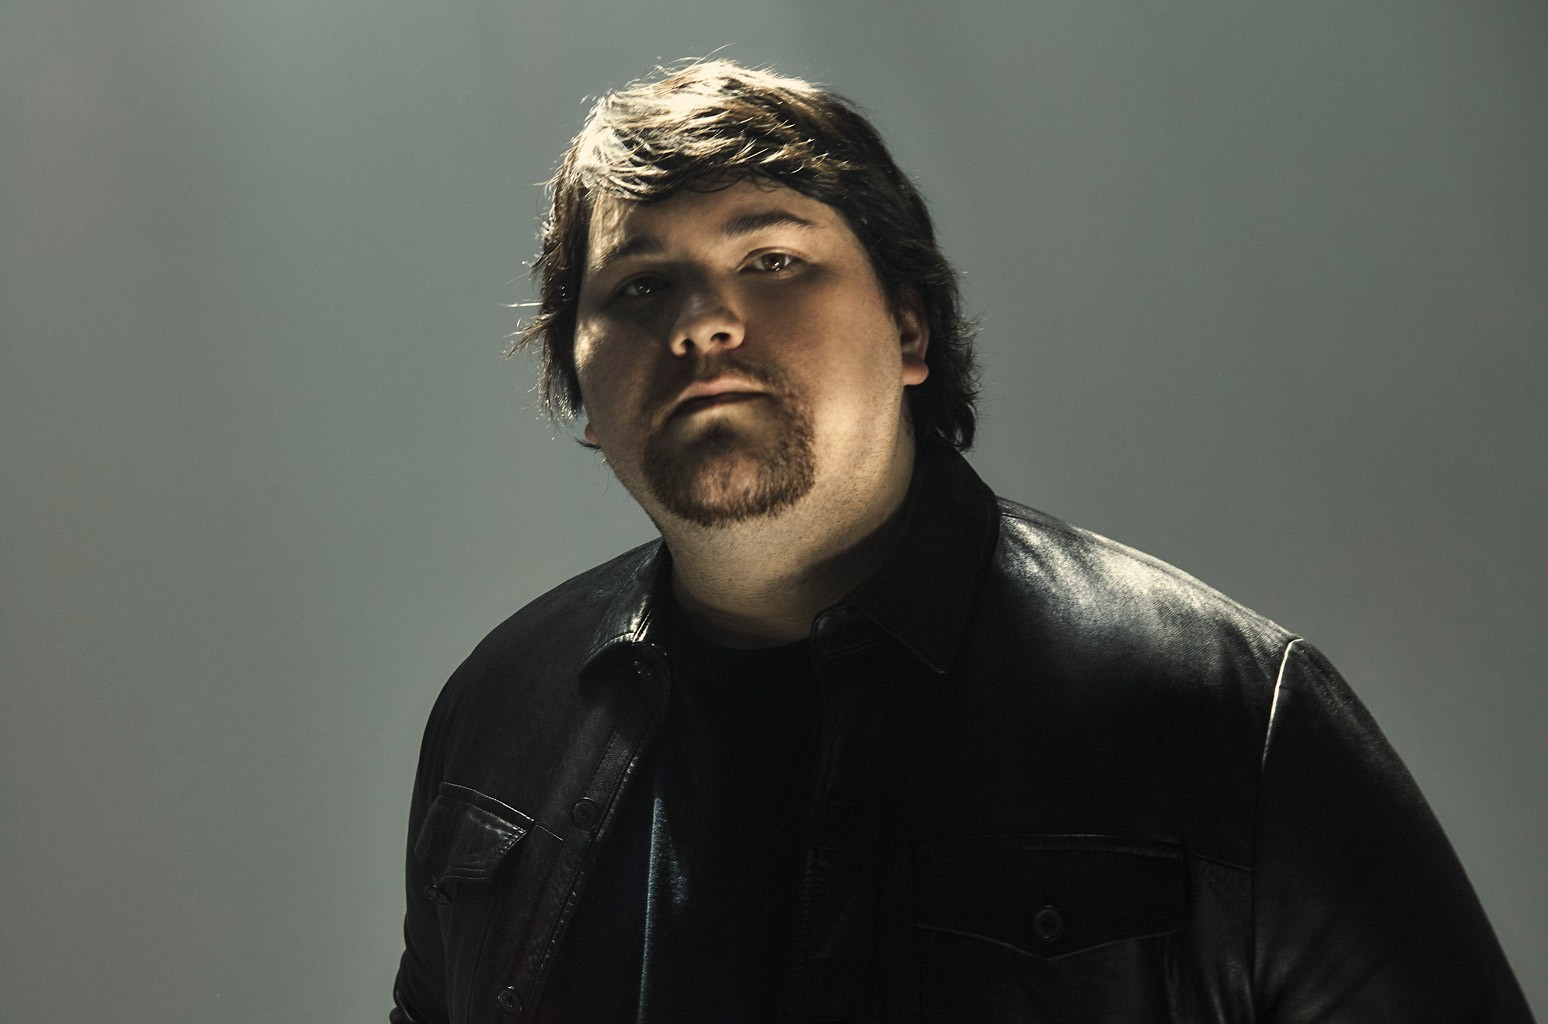 Дань уважения Эдди Ван Халена «Distance» из Mammoth WVH регламентирует мейнстрим рок-трансляций